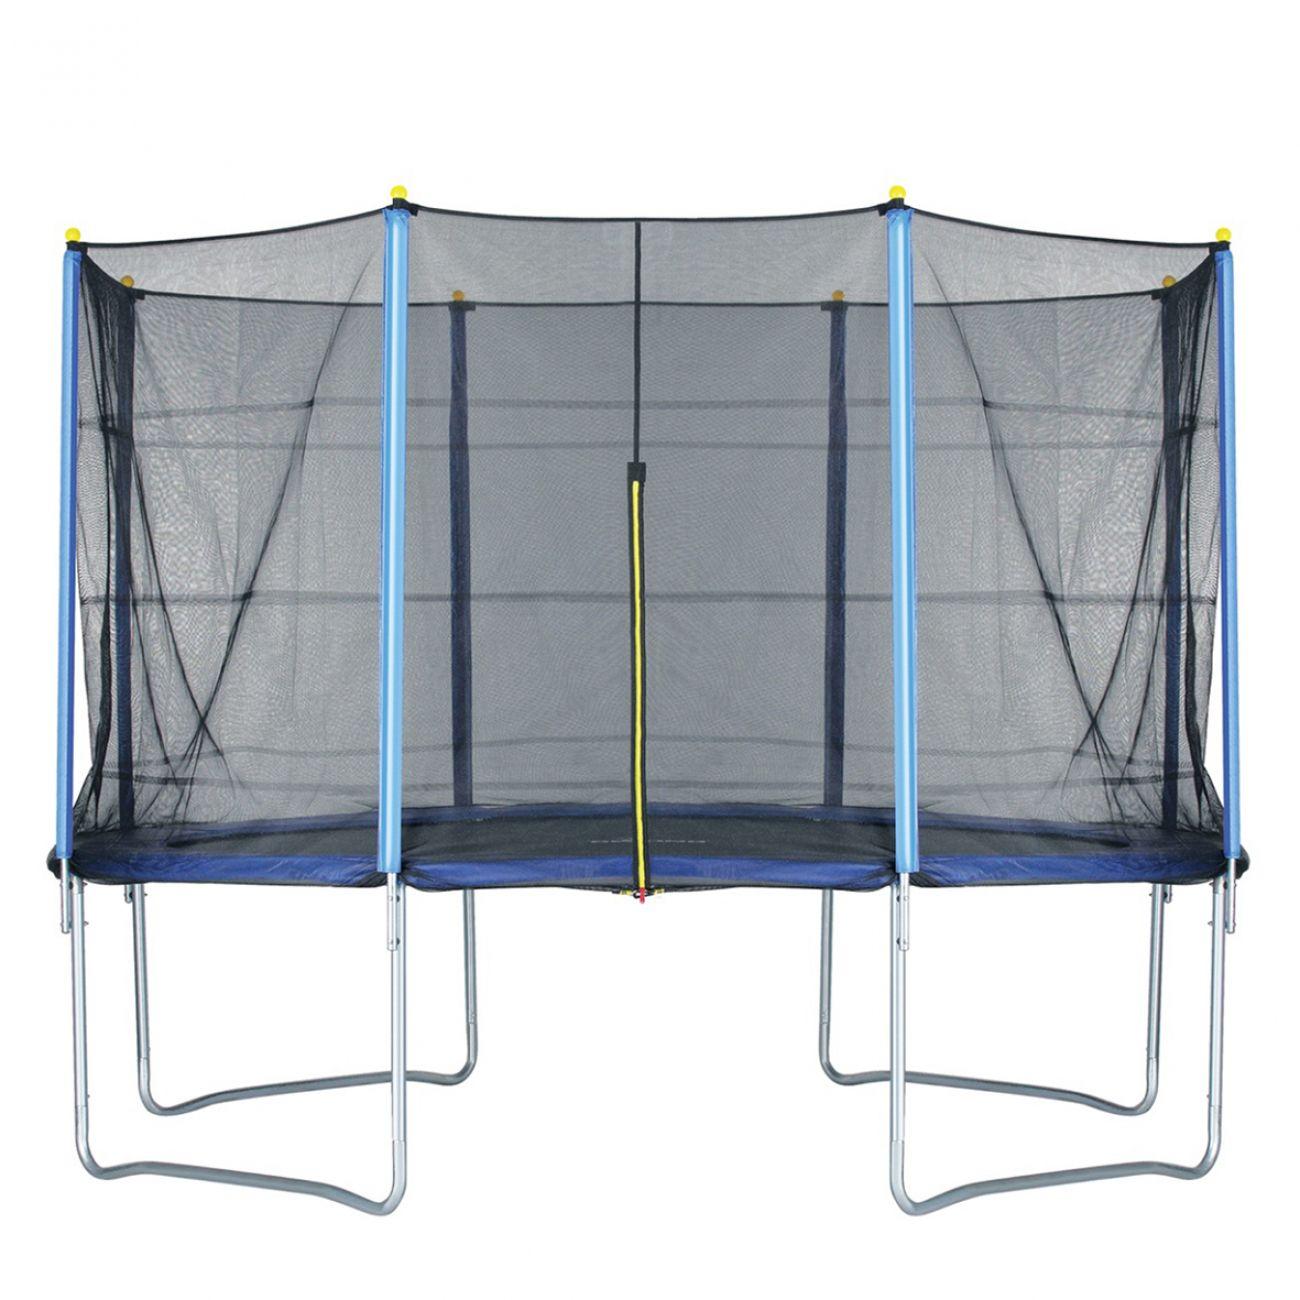 Trampolin+mreža set, 396 cm